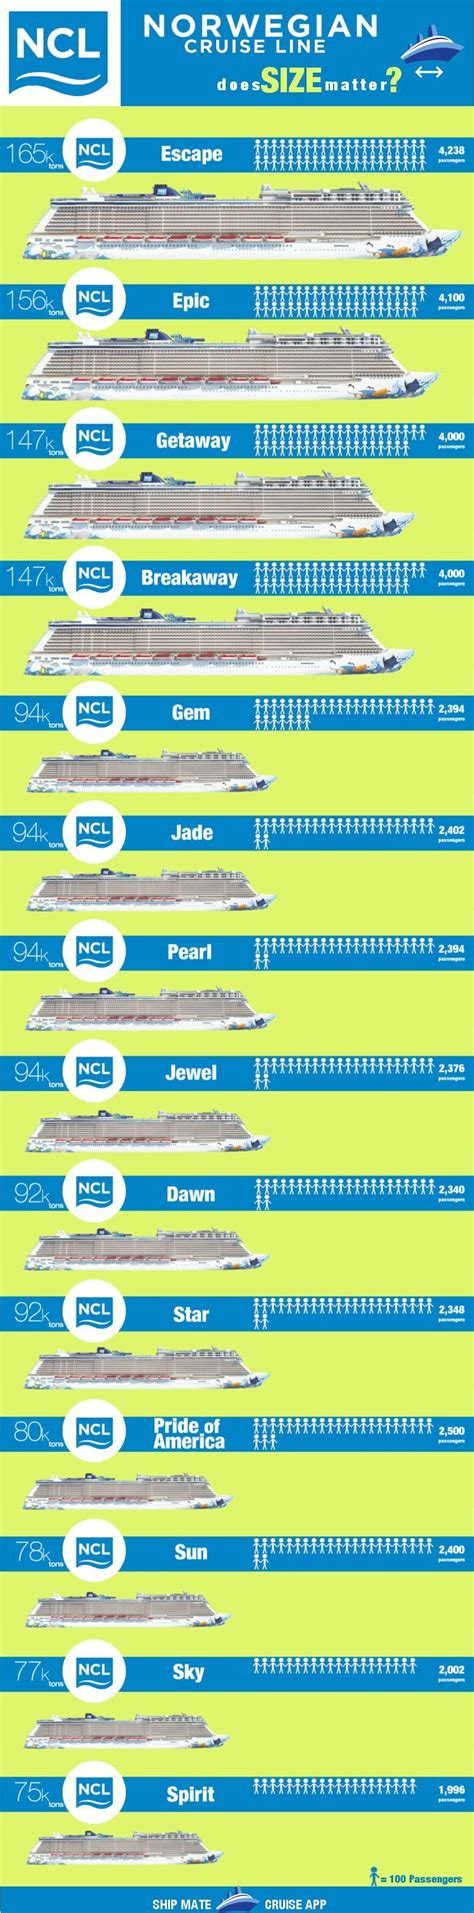 Carnival cruise ships size comparison